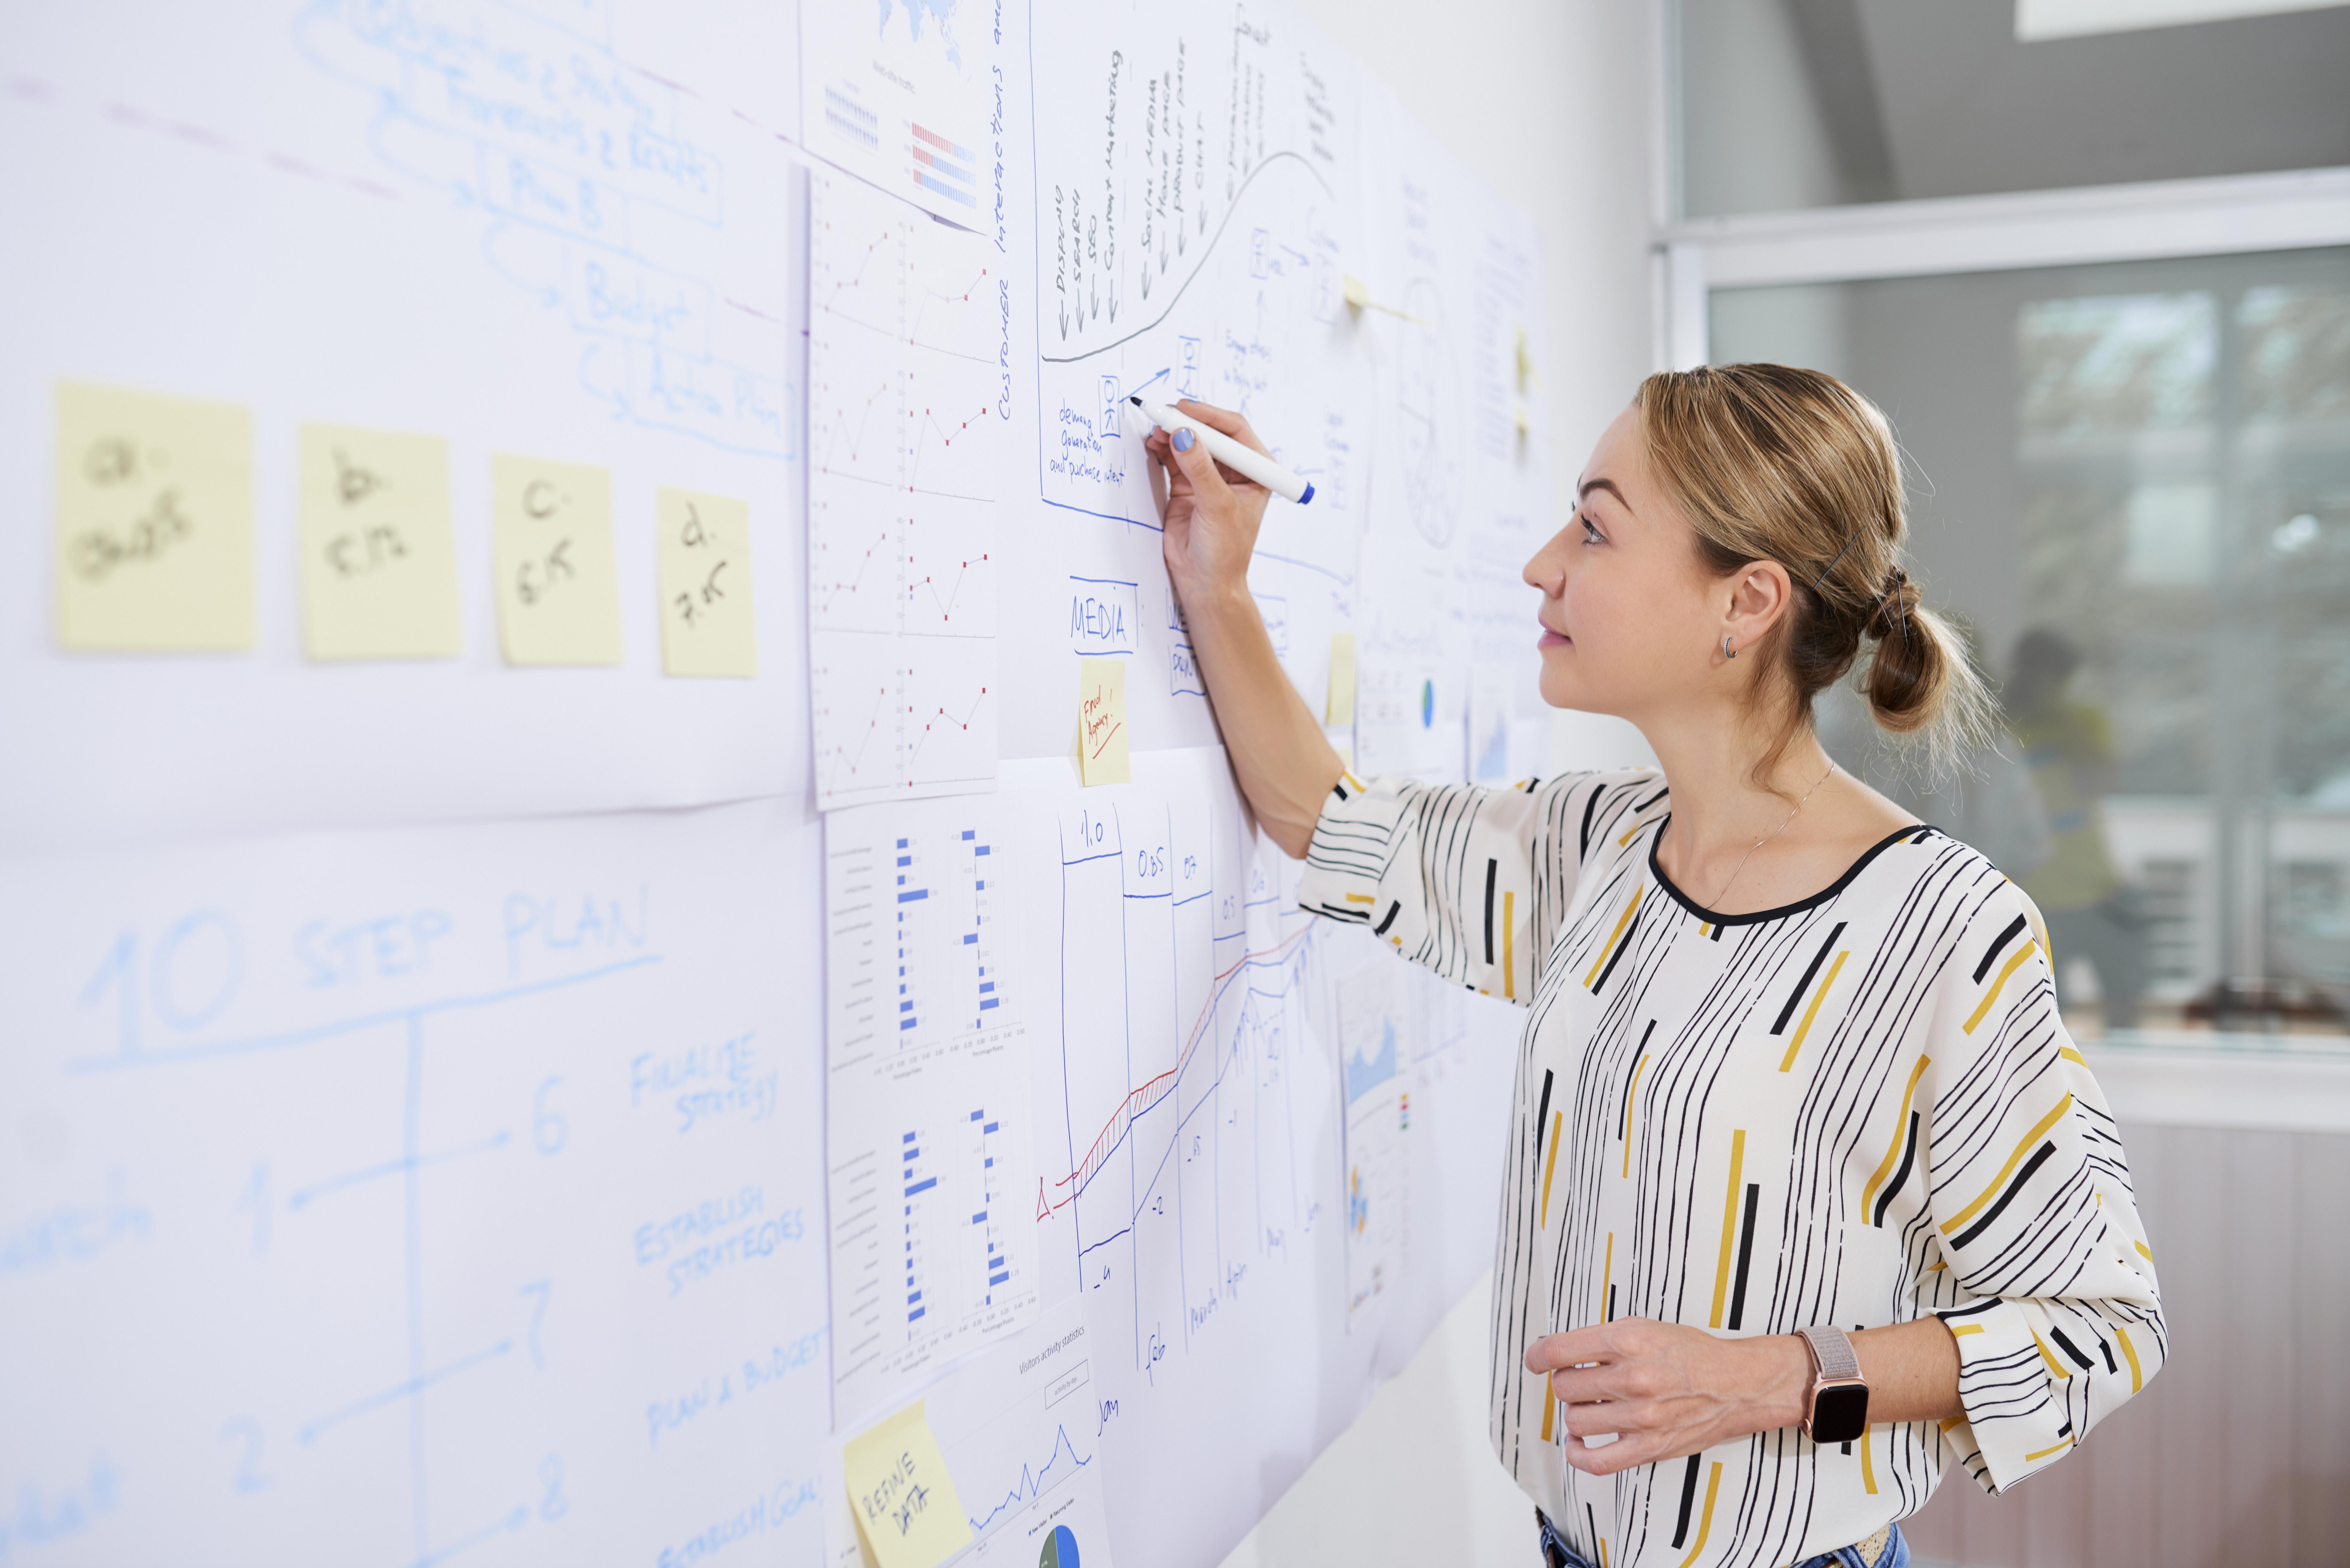 marketing-department-manager-drawing-chart-U3XLNYT